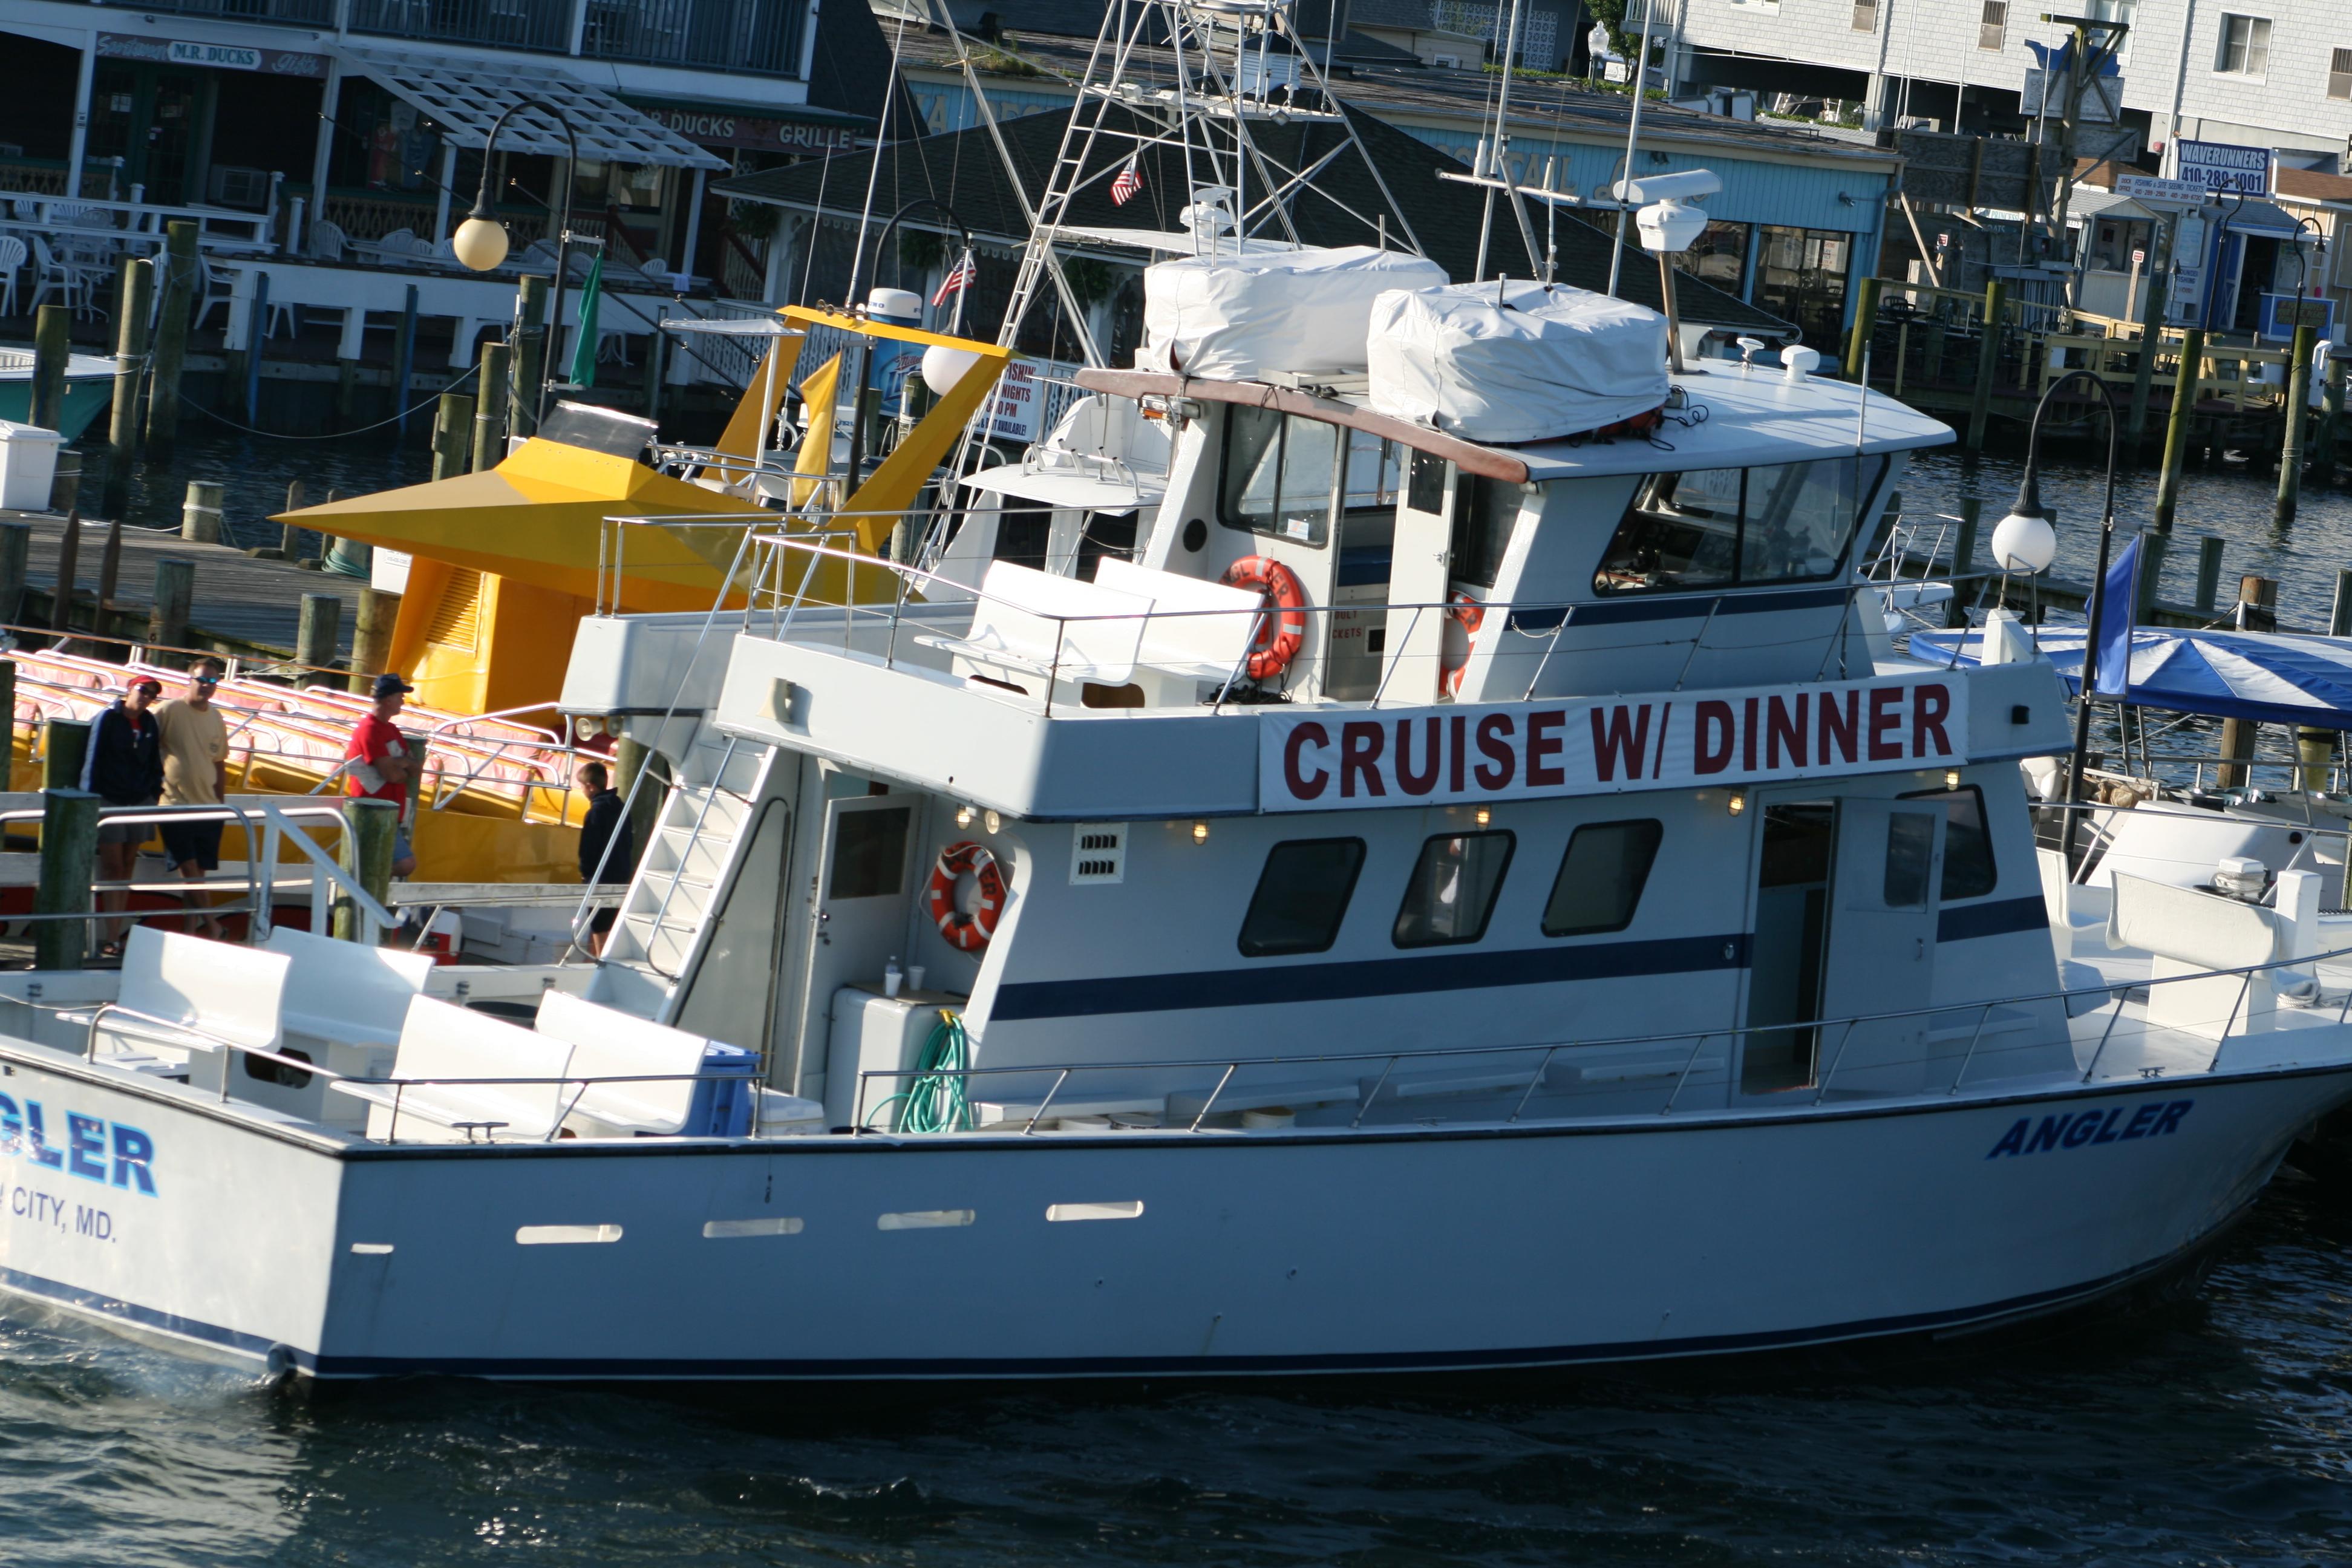 Cruise Boat, Boat, Cruise, Dinner, Docks, HQ Photo